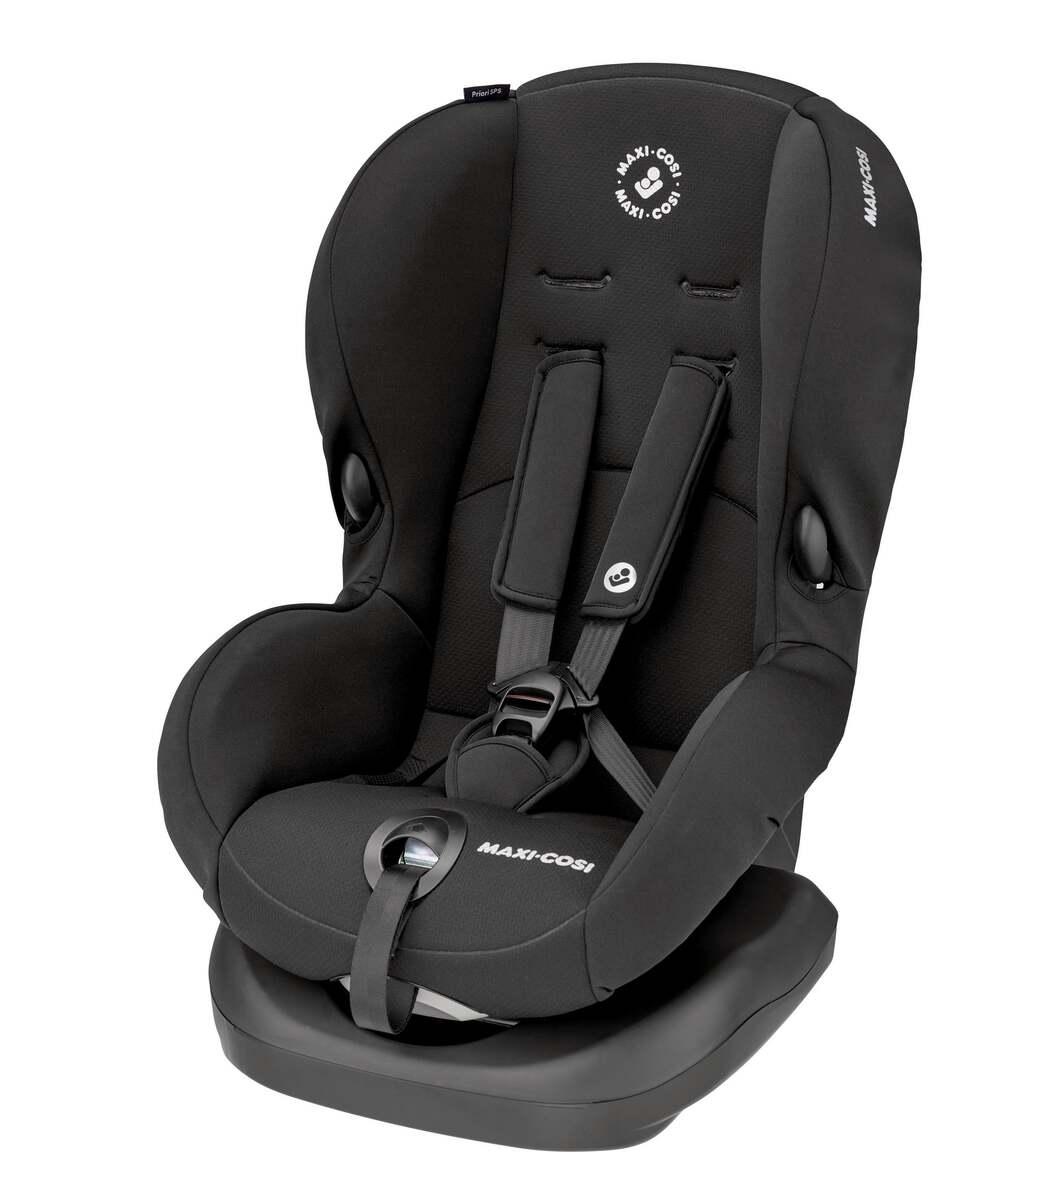 "Bild 3 von Maxi-Cosi Auto-Kindersitz ""Priori SPS+"", Basic Black"